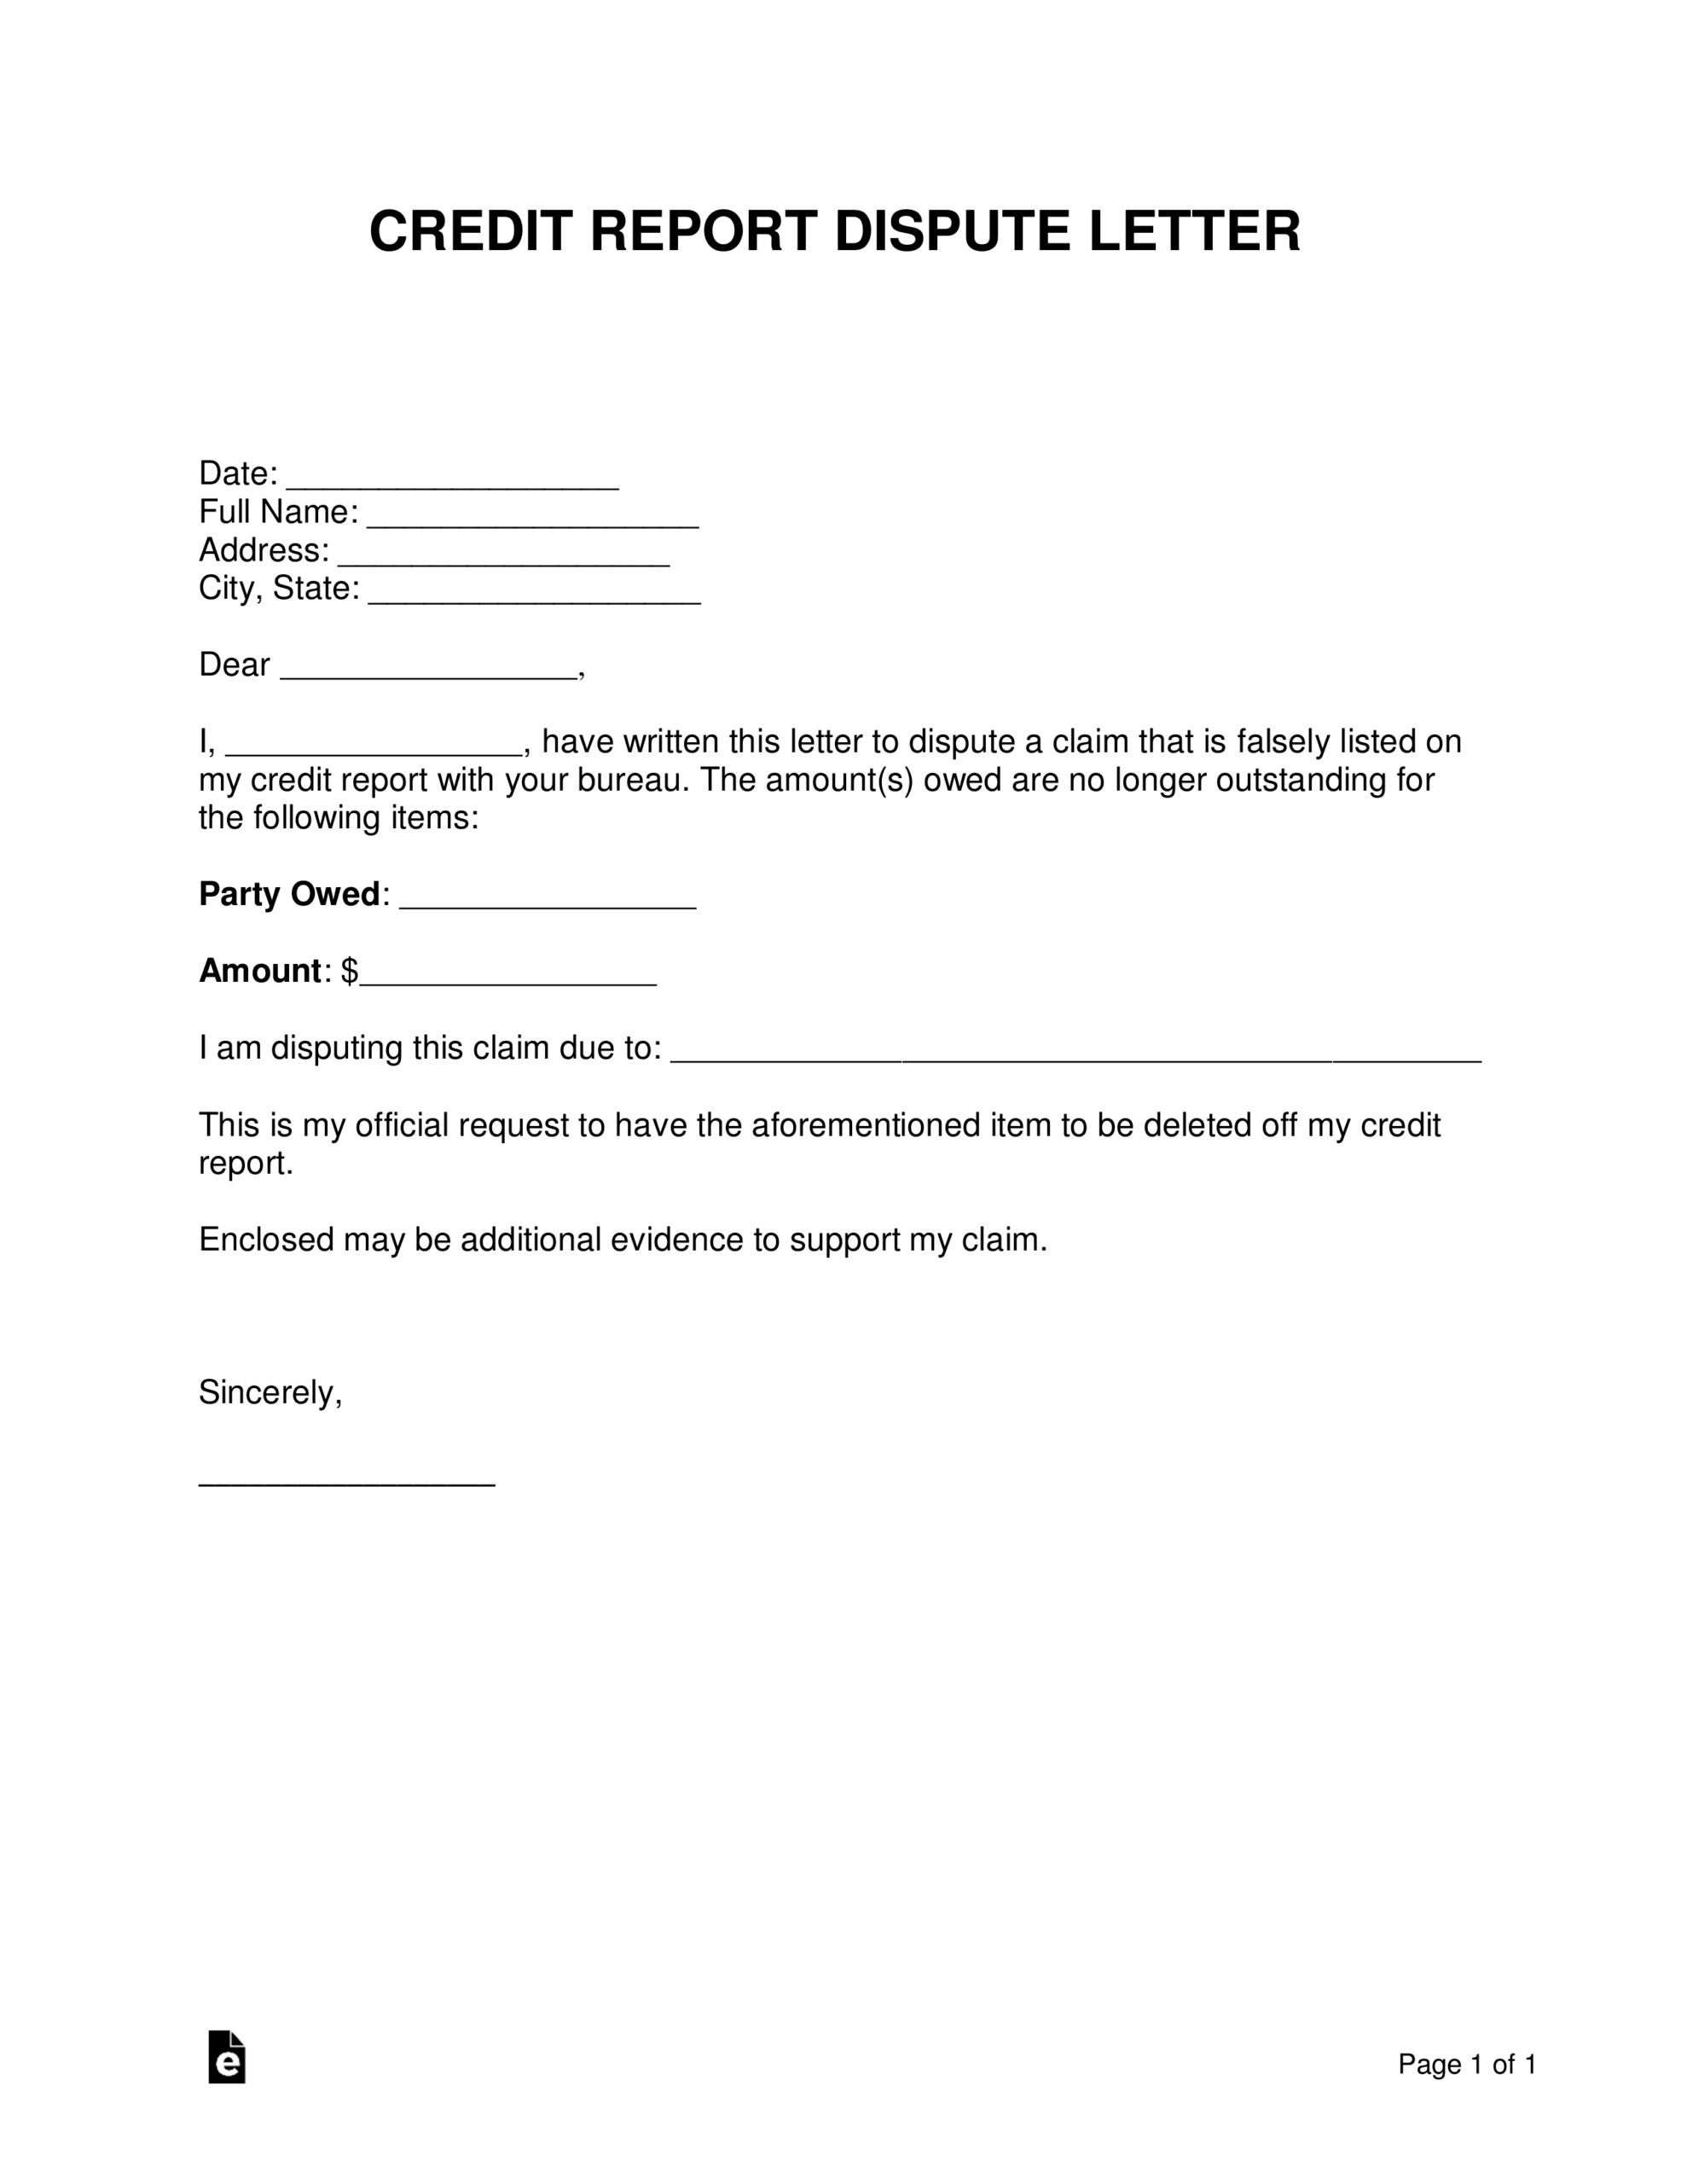 Free Credit Report Dispute Letter Template – Sample – Word Inside Credit Report Dispute Letter Template